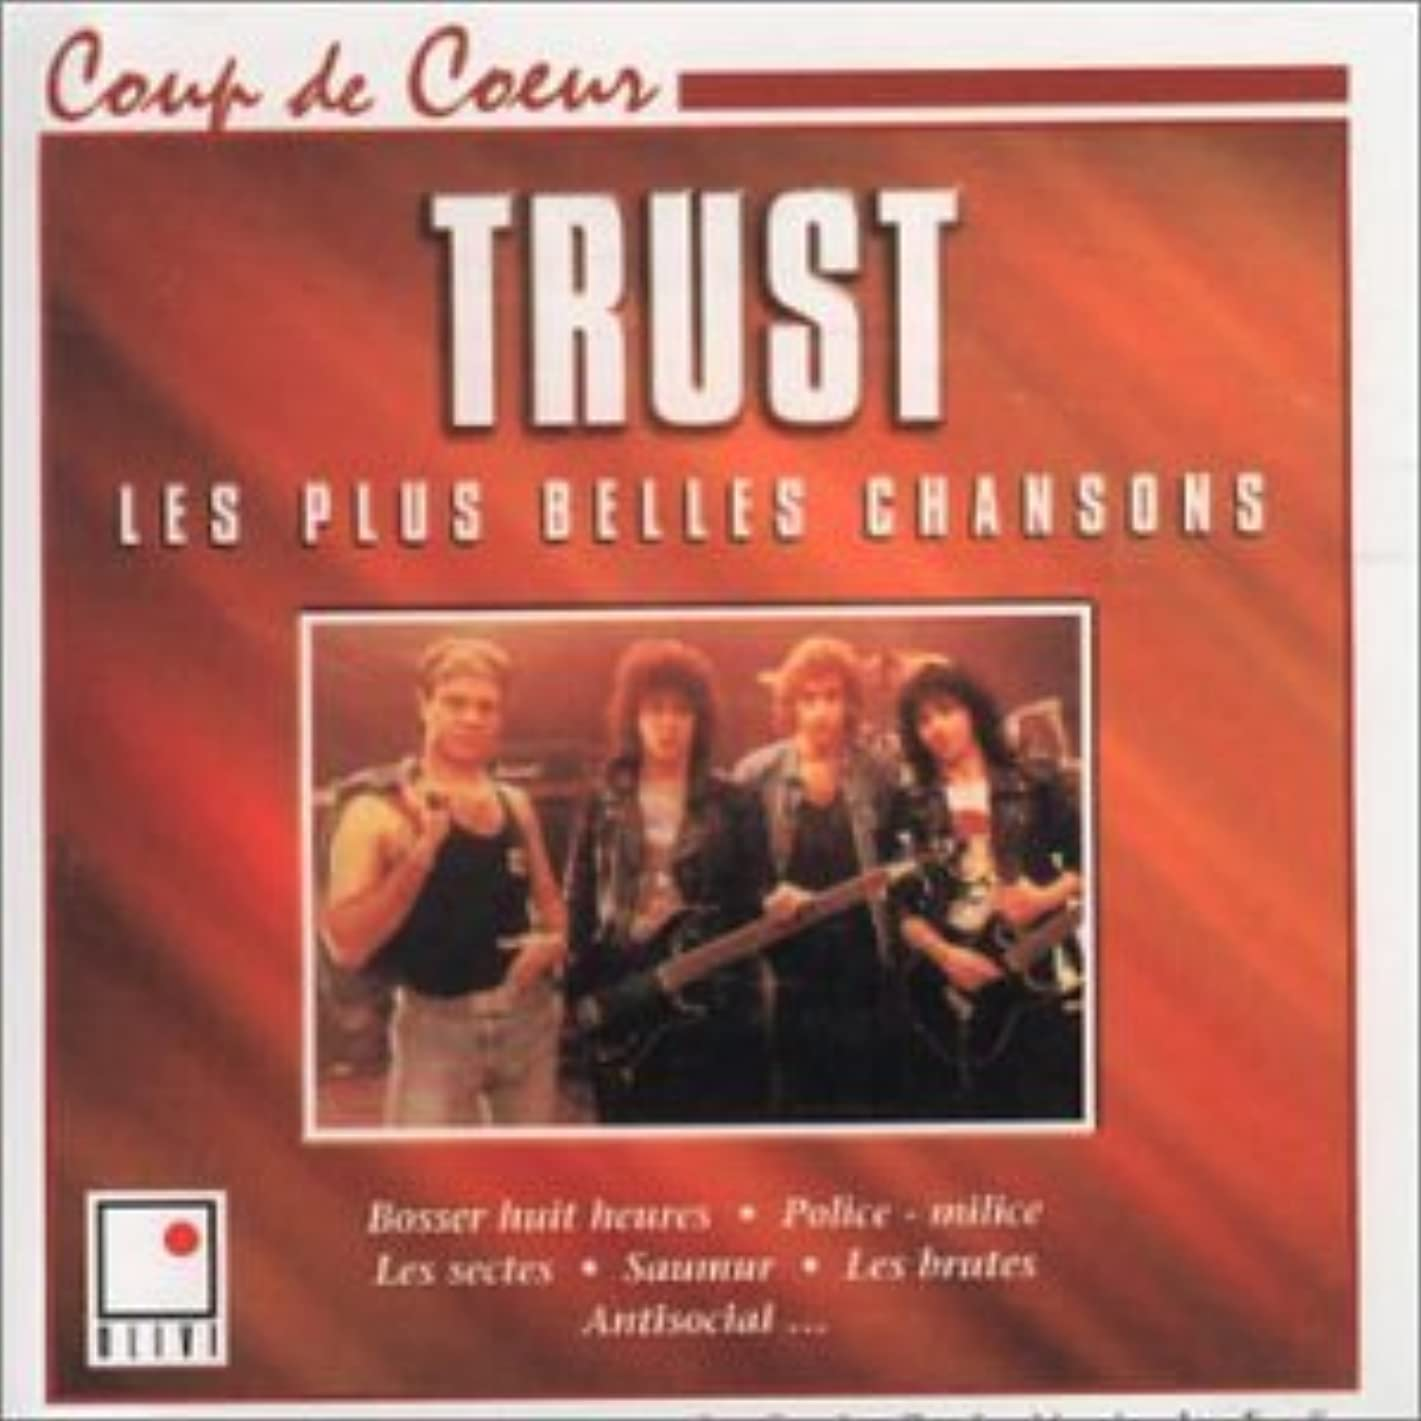 Olus Belles Chansons by Trust